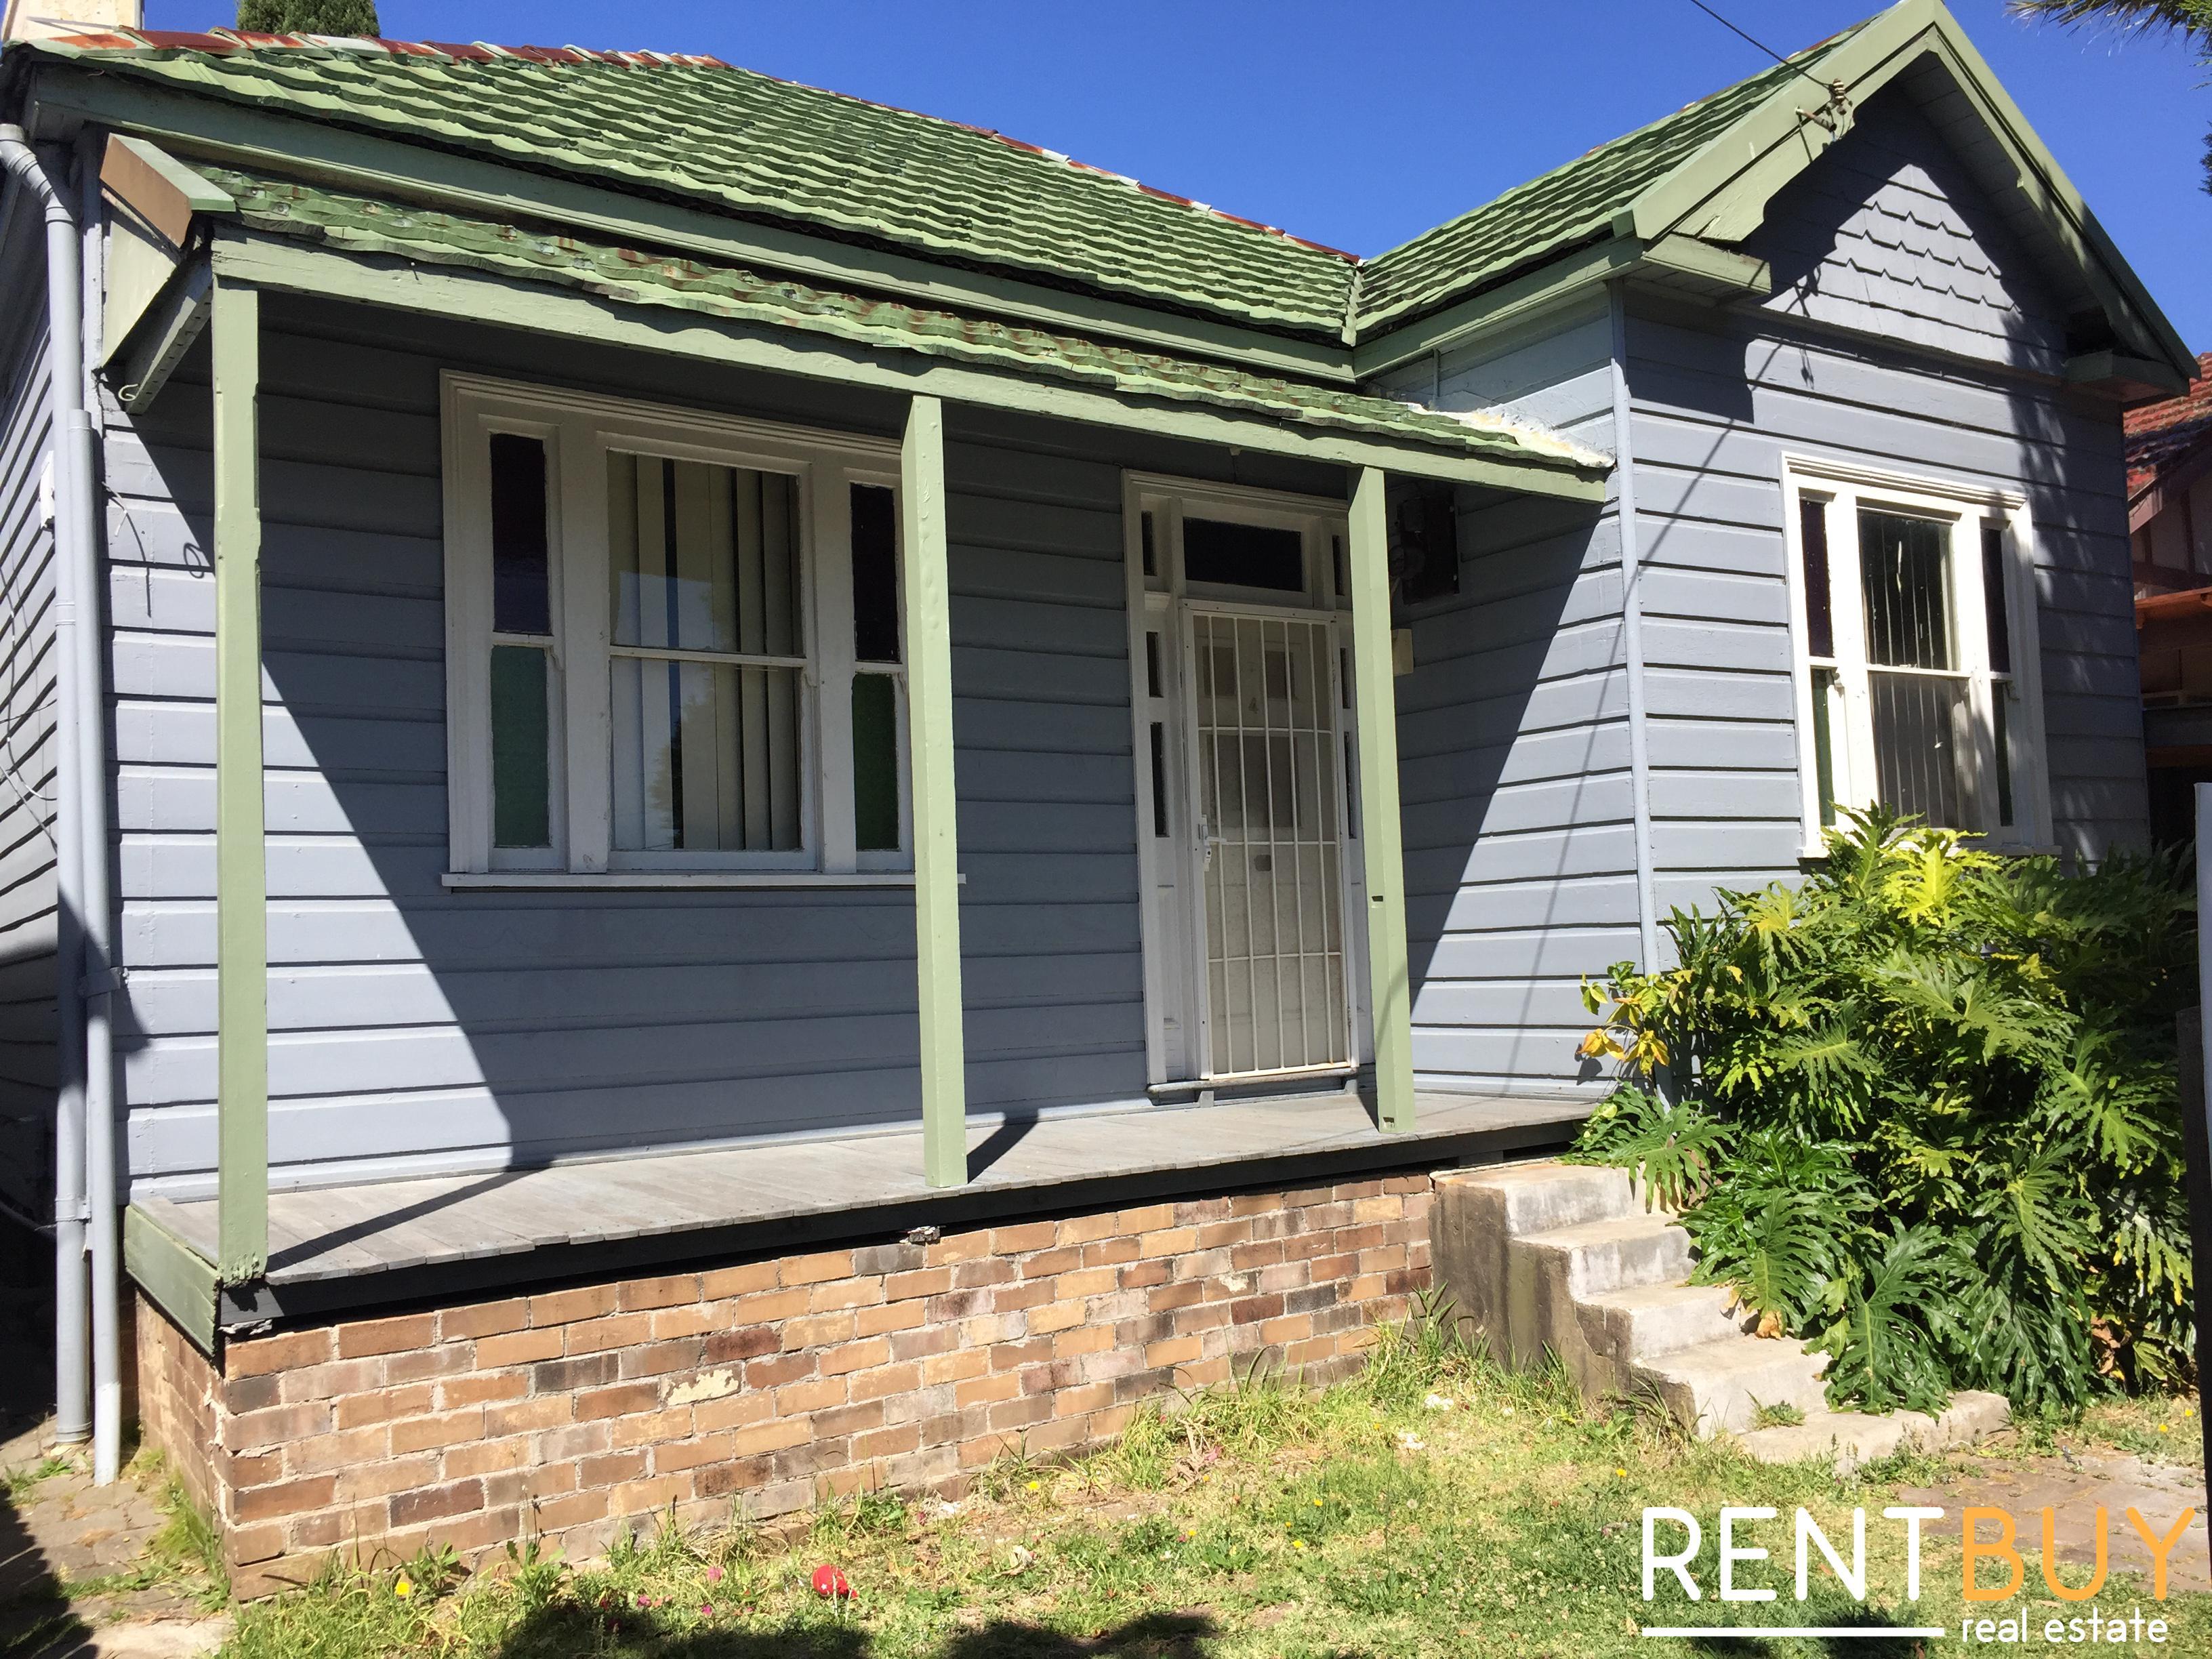 THREE BEDROOM RENOVATED HOUSE